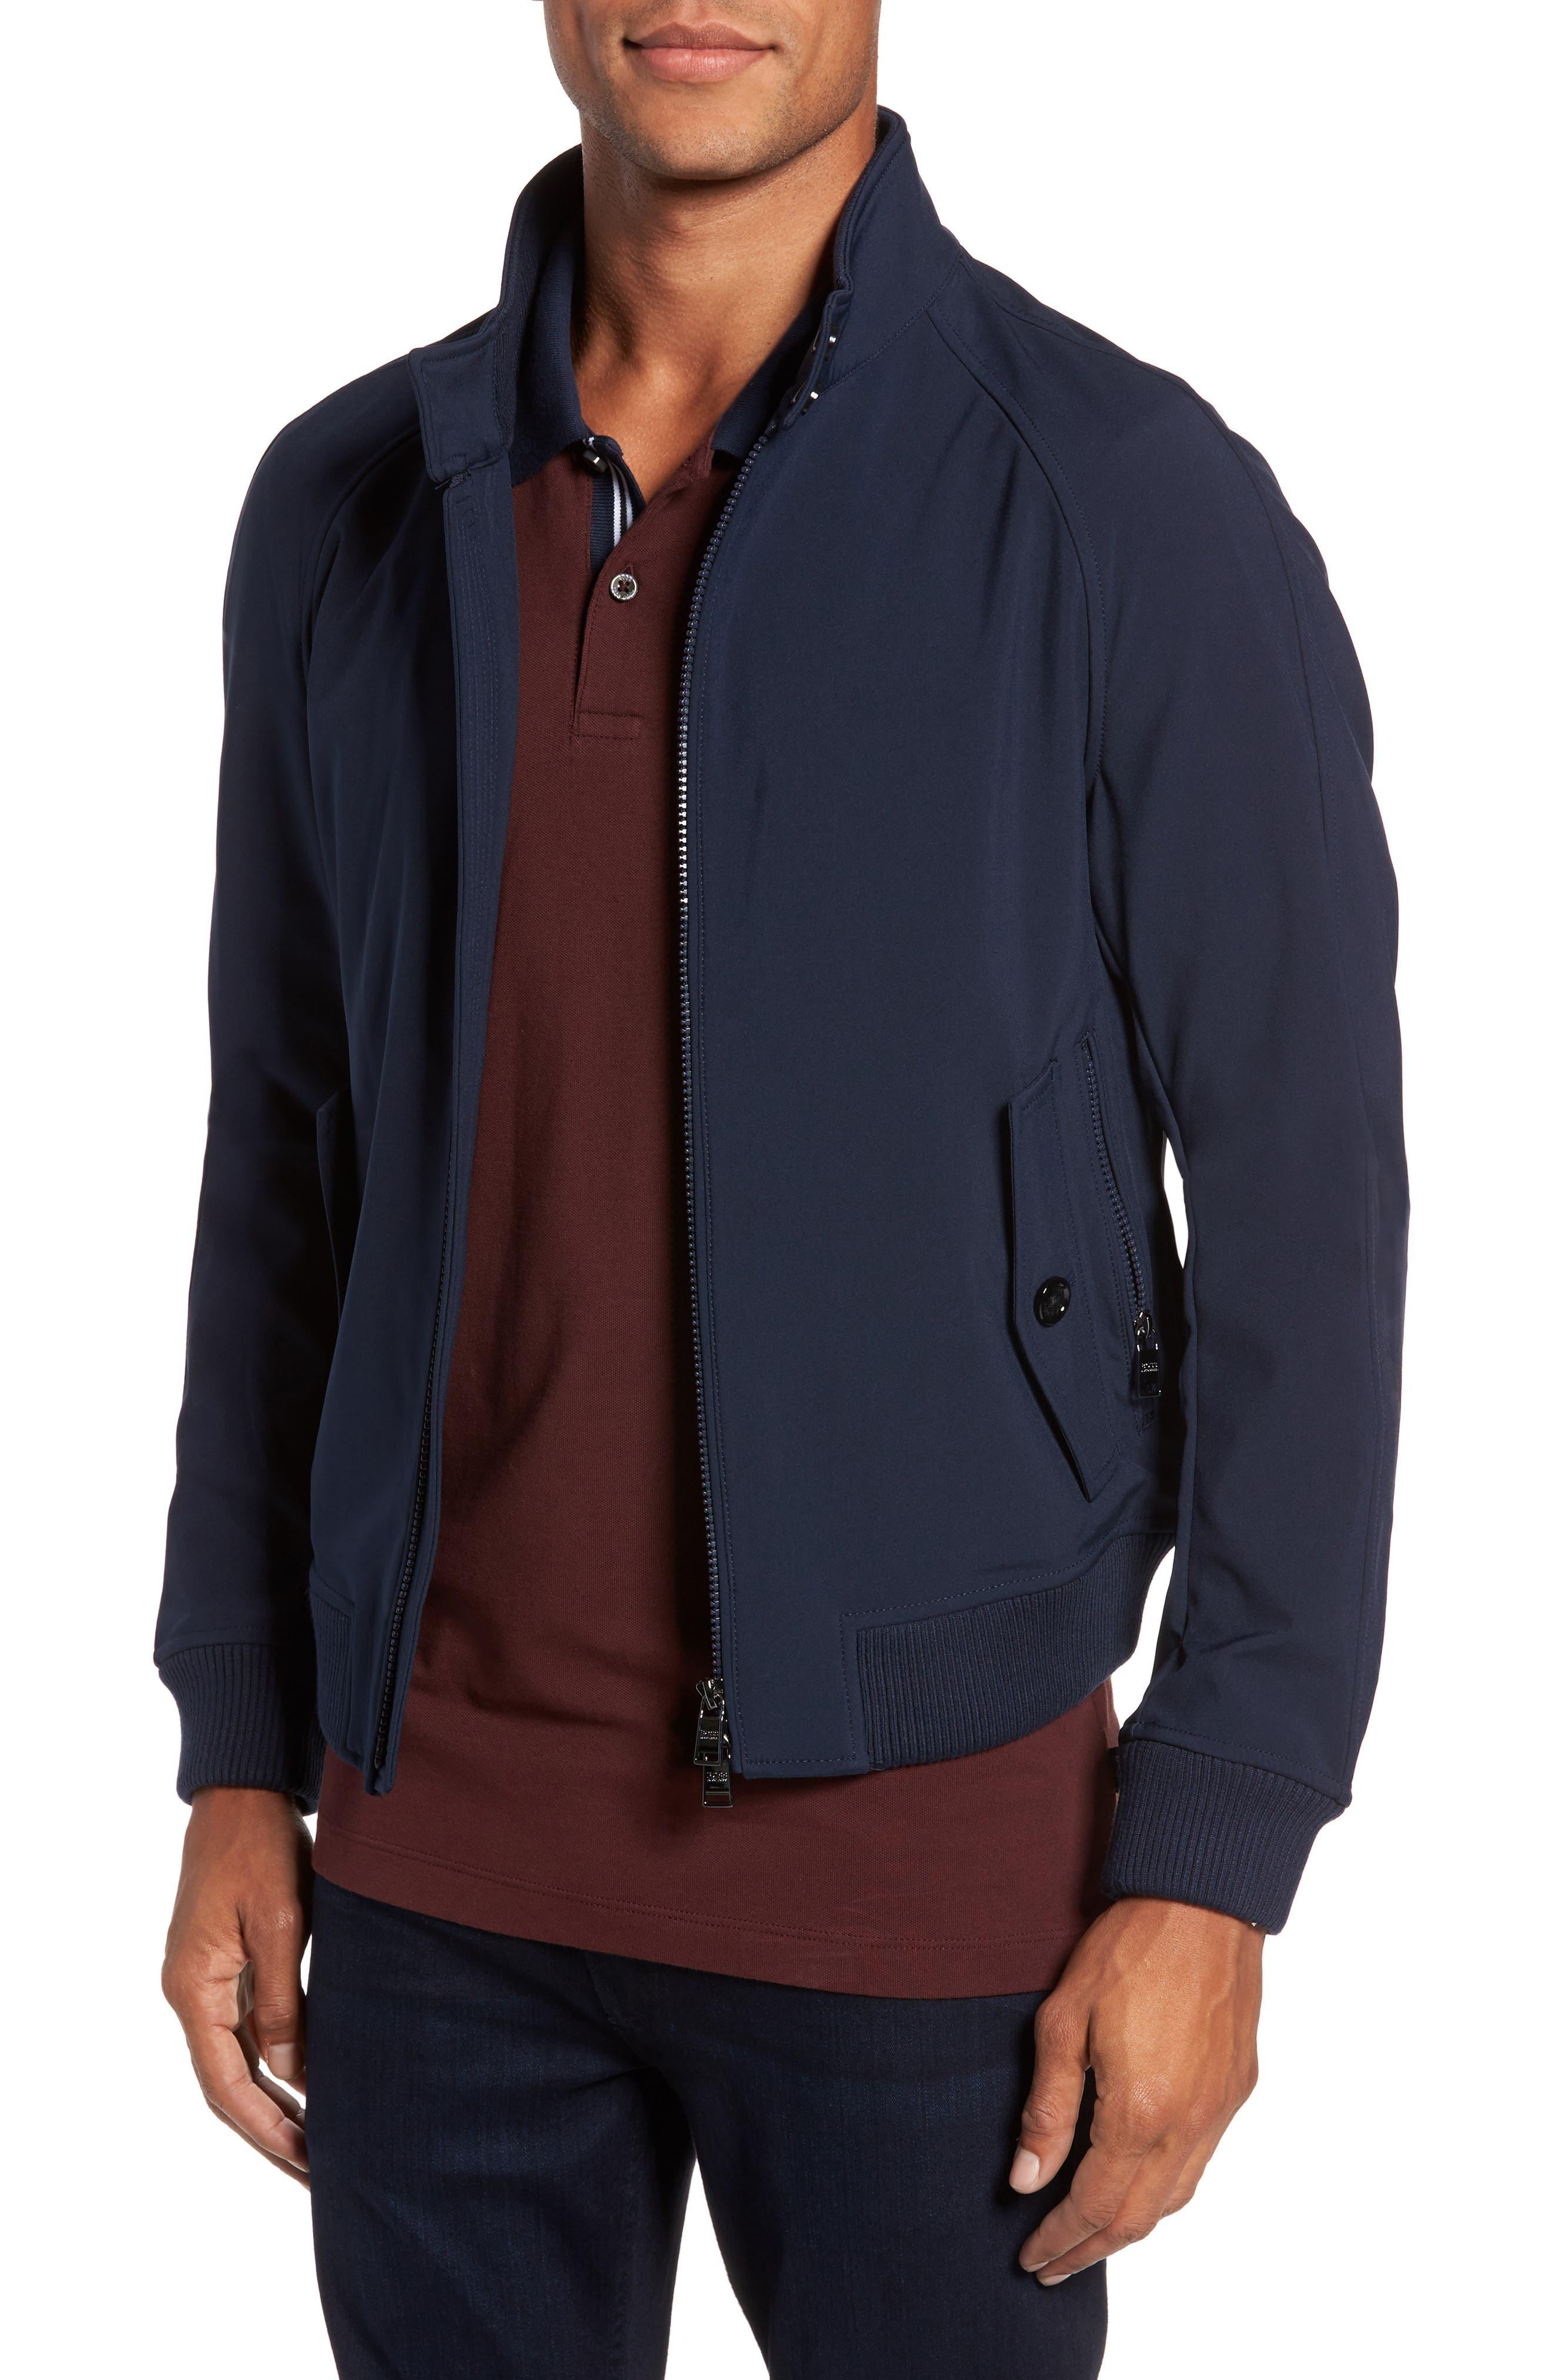 Corva Technical Jacket,                         Main,                         color, 410